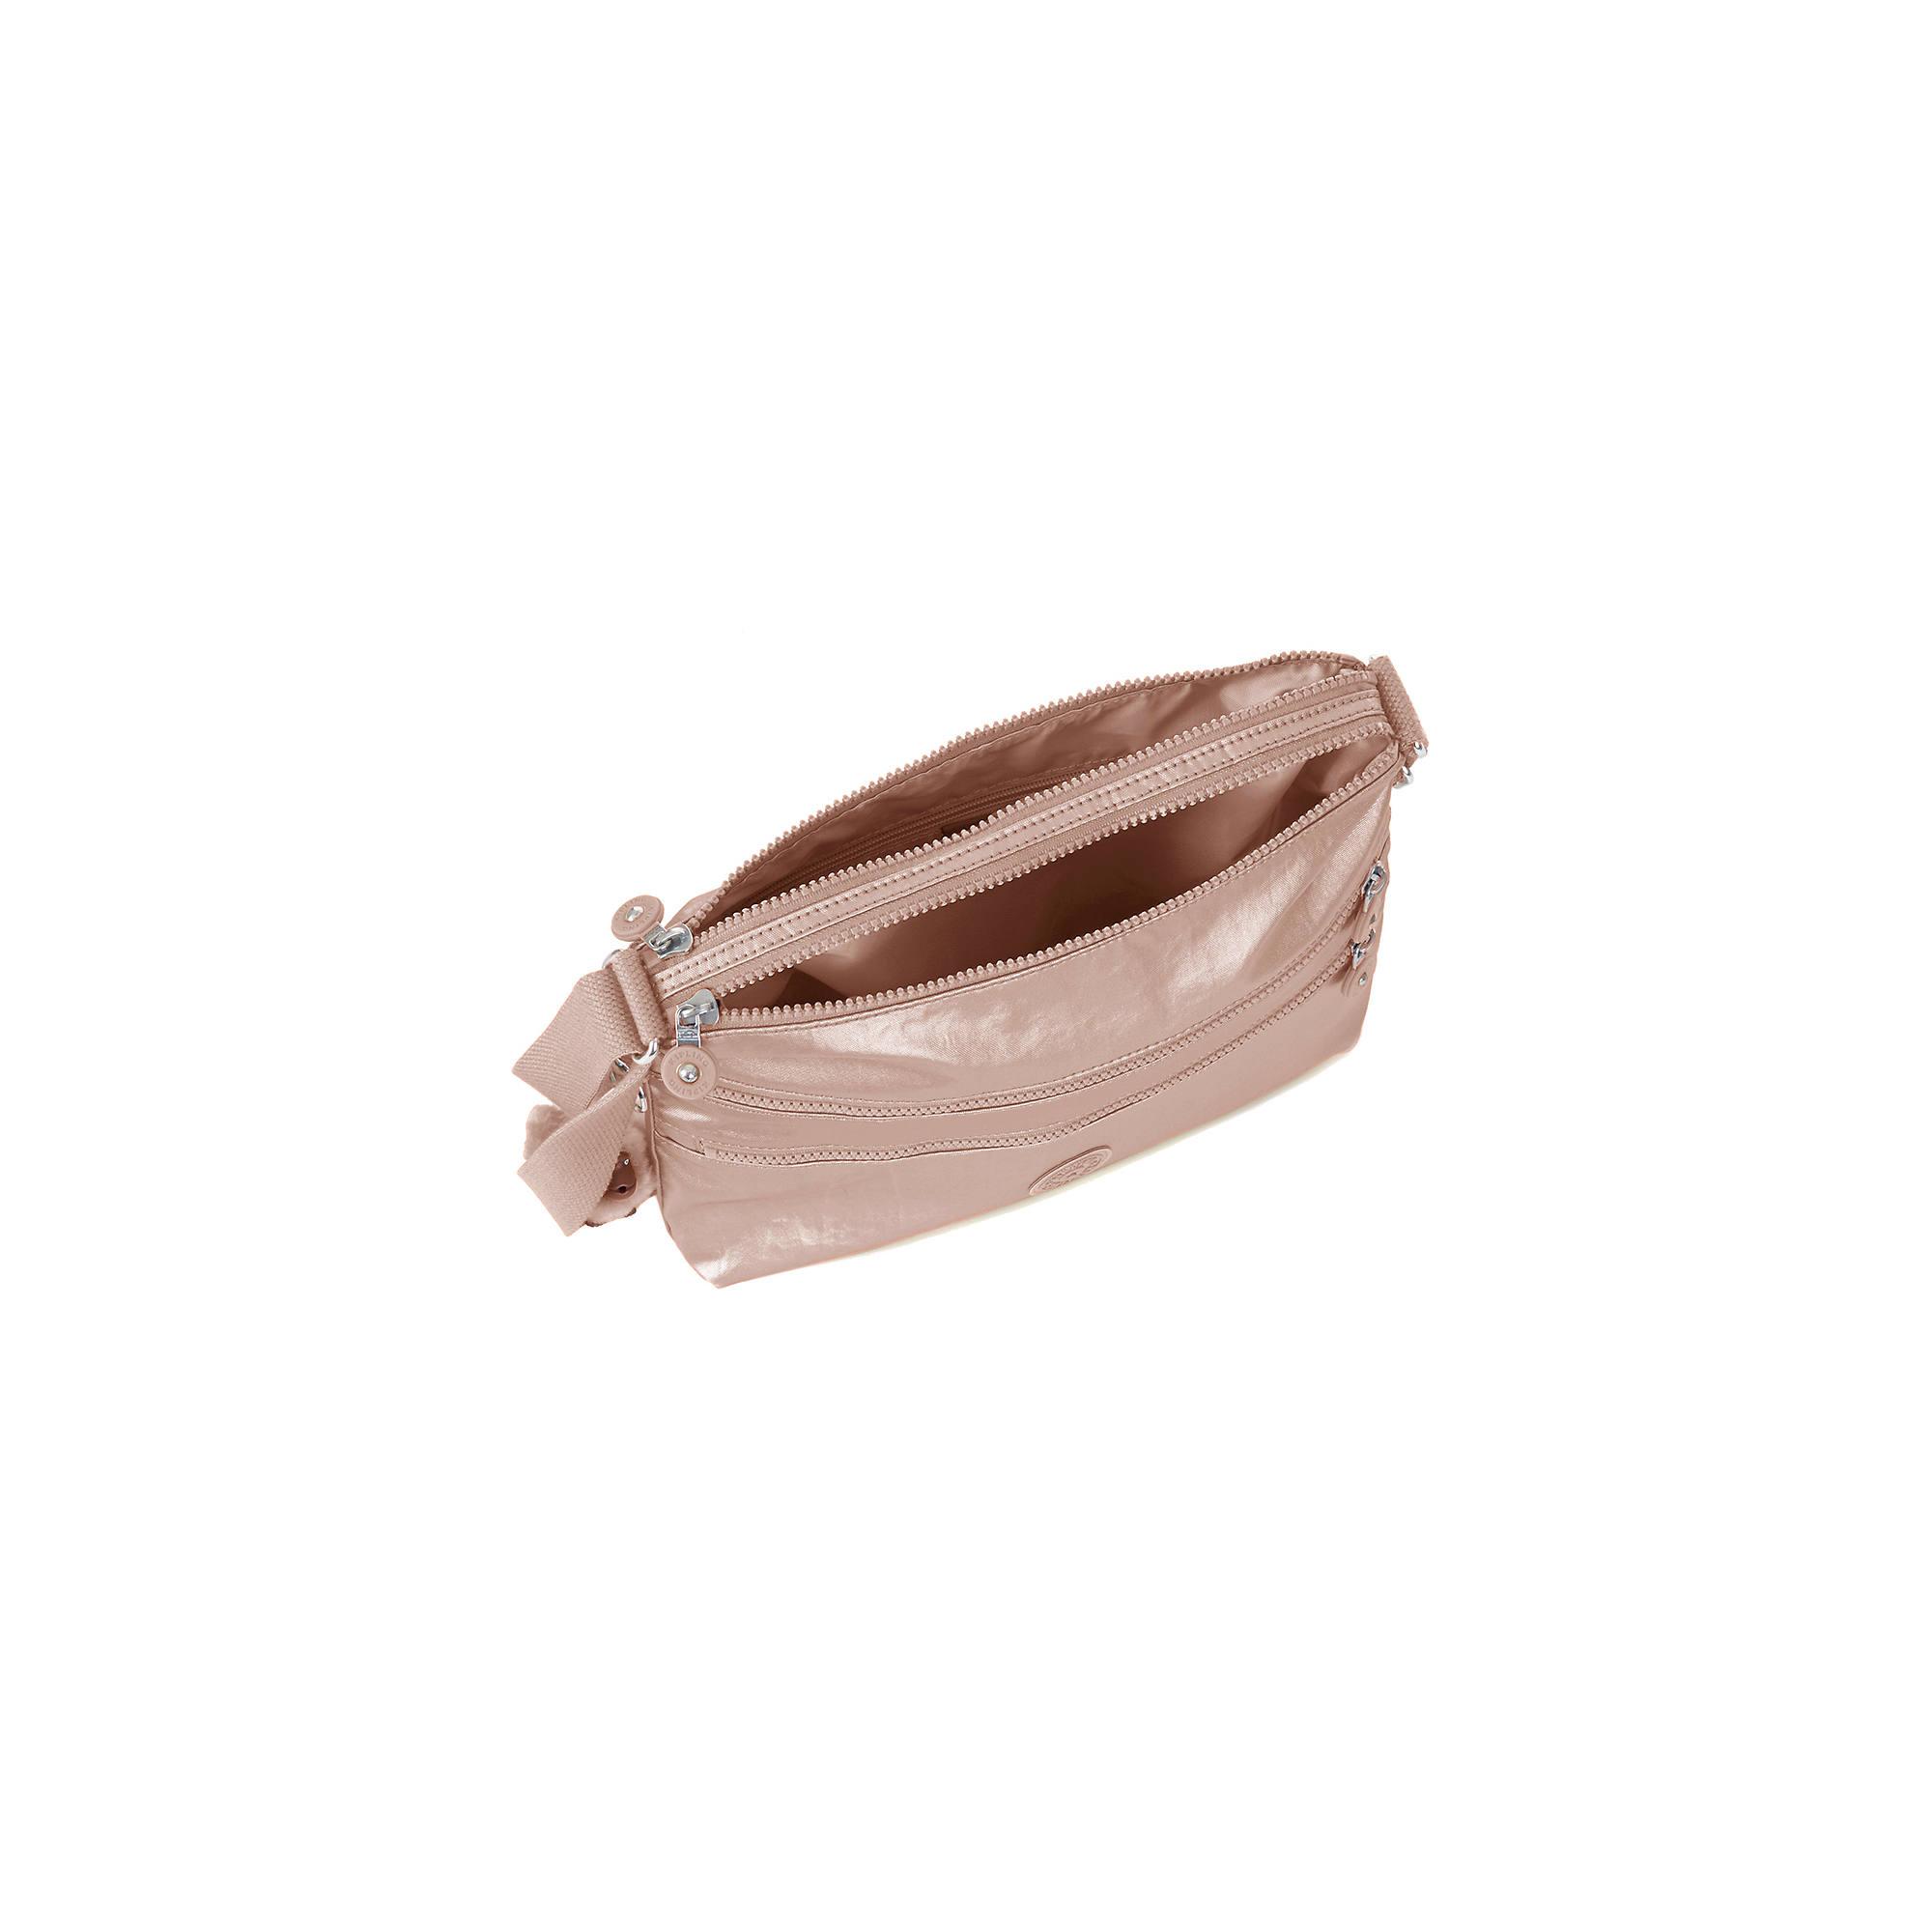 Kipling-Alvar-Metallic-Crossbody-Bag miniature 36